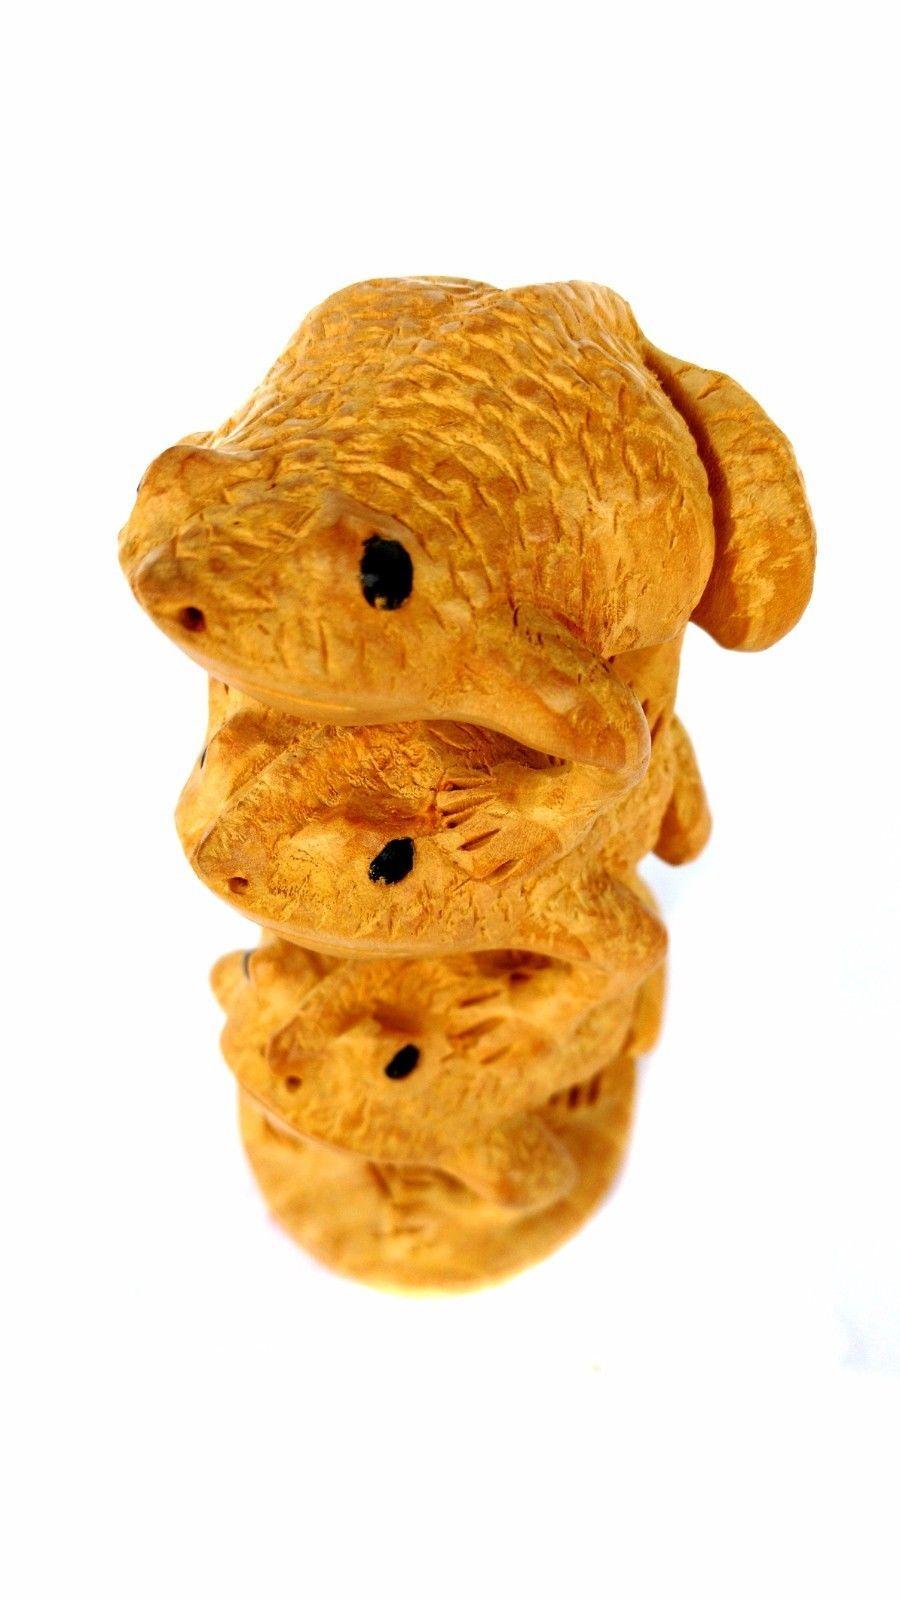 Carved Rare Wild Animal 3 Frog Sculpture Figurine Wooden Frog Statue Art Hand  image 2